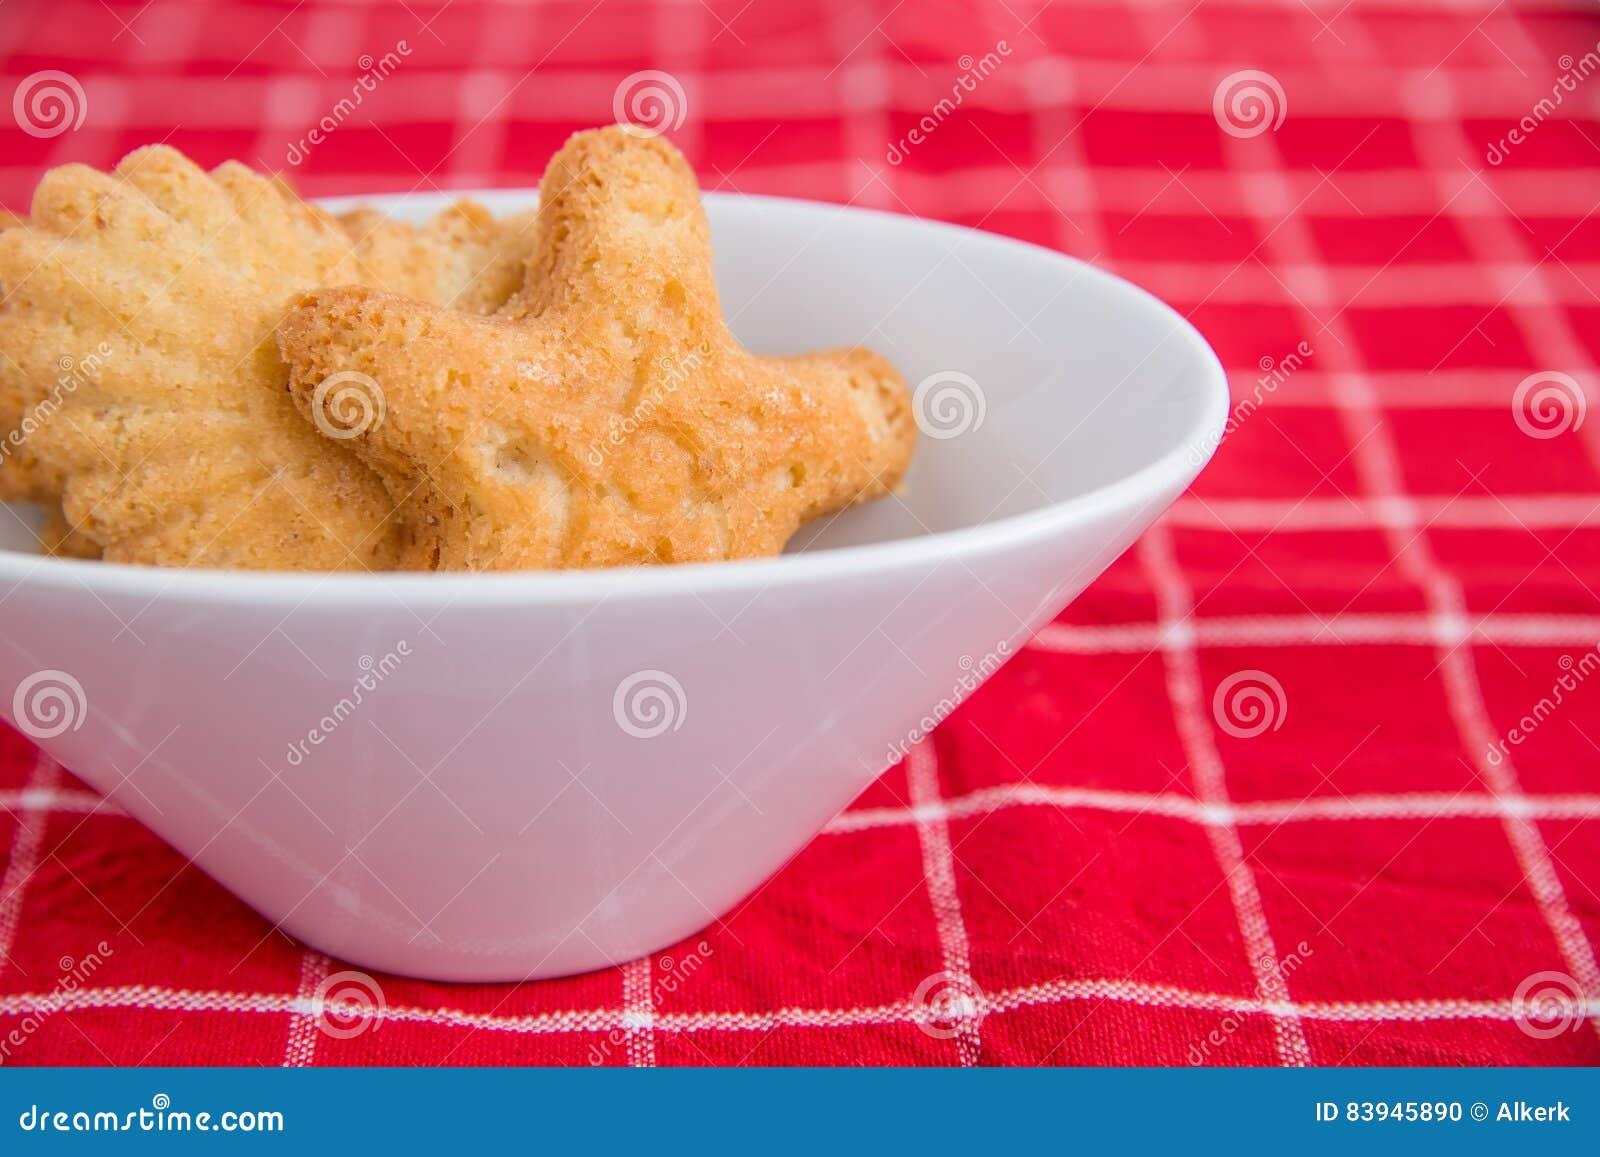 Dish Of Norwegian Christmas Cookies Stock Photo Image Of Dessert